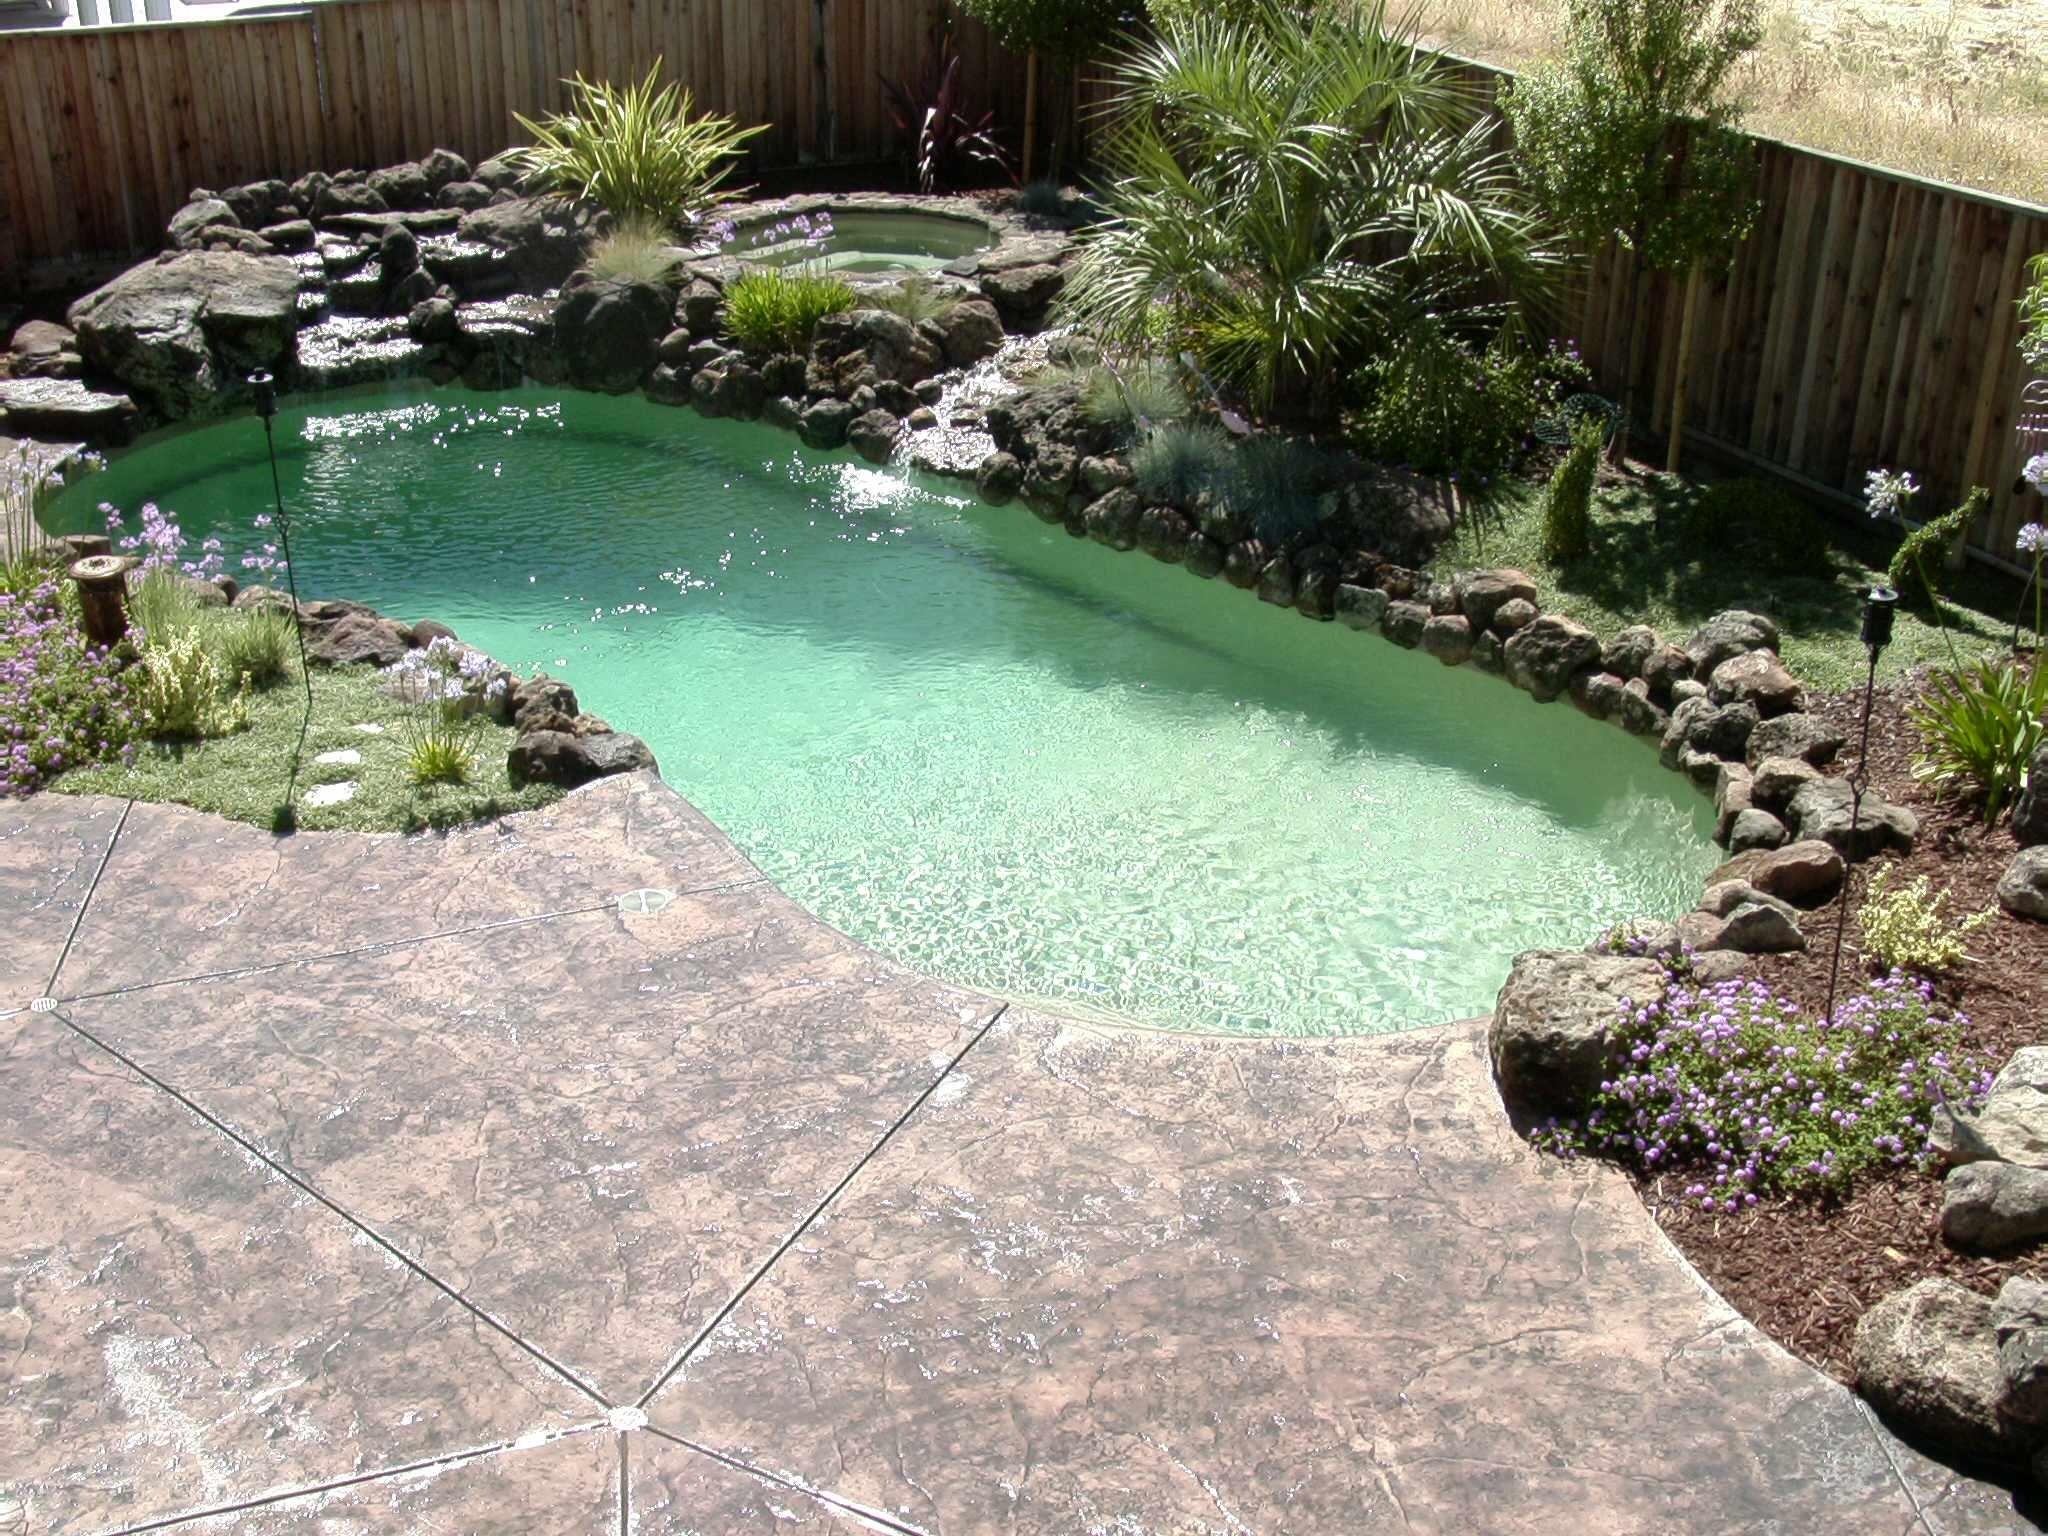 Blue Hawaiian Inground Pools Of Michigan ⋆ Inground